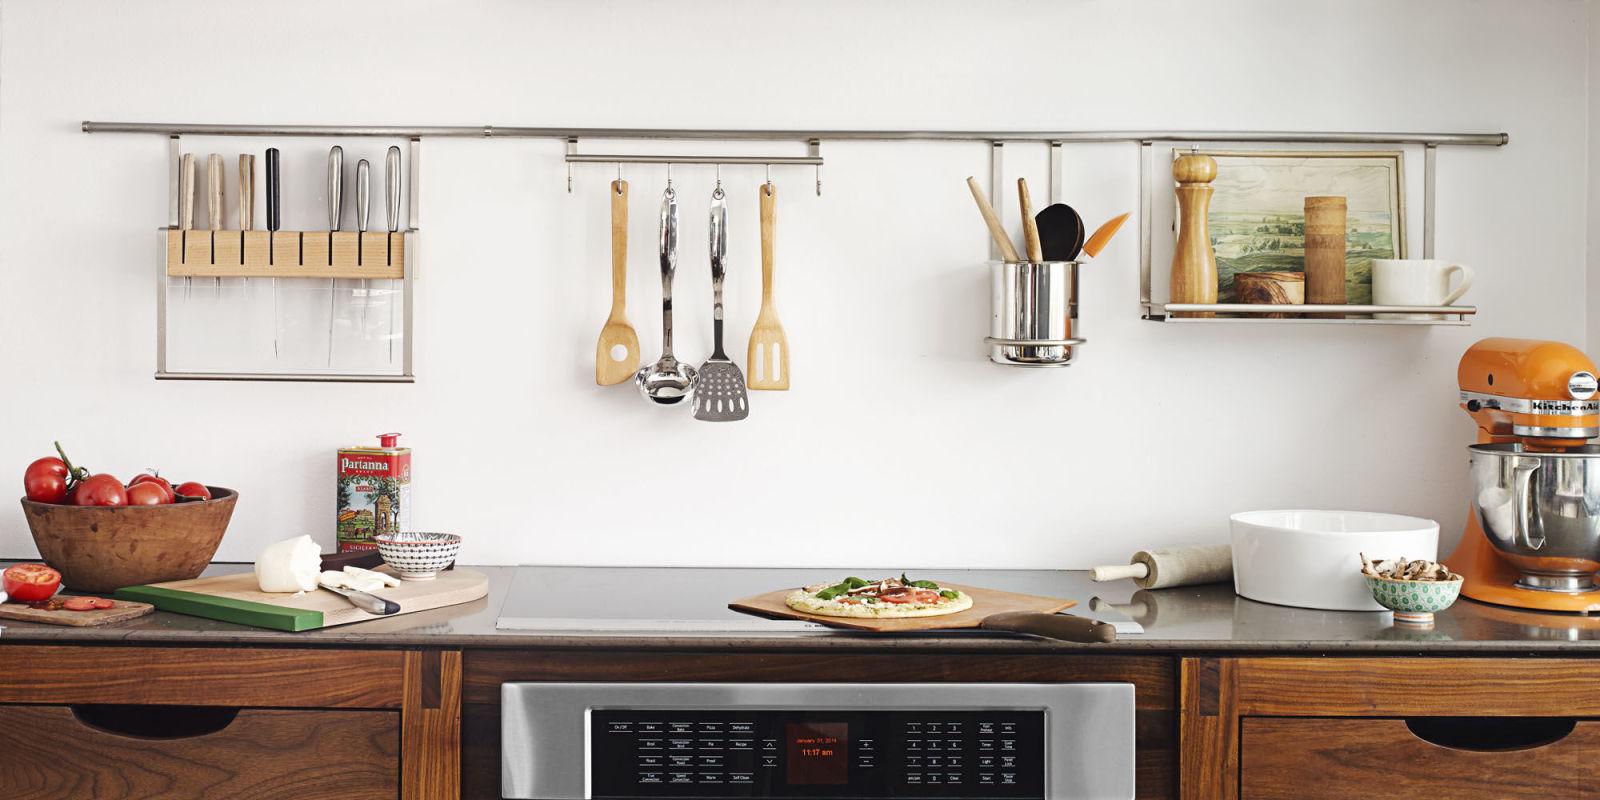 Uncategorized Kitchen Countertop Shelves 11 organization tricks that keep countertops clear kitchen decluttering ideas